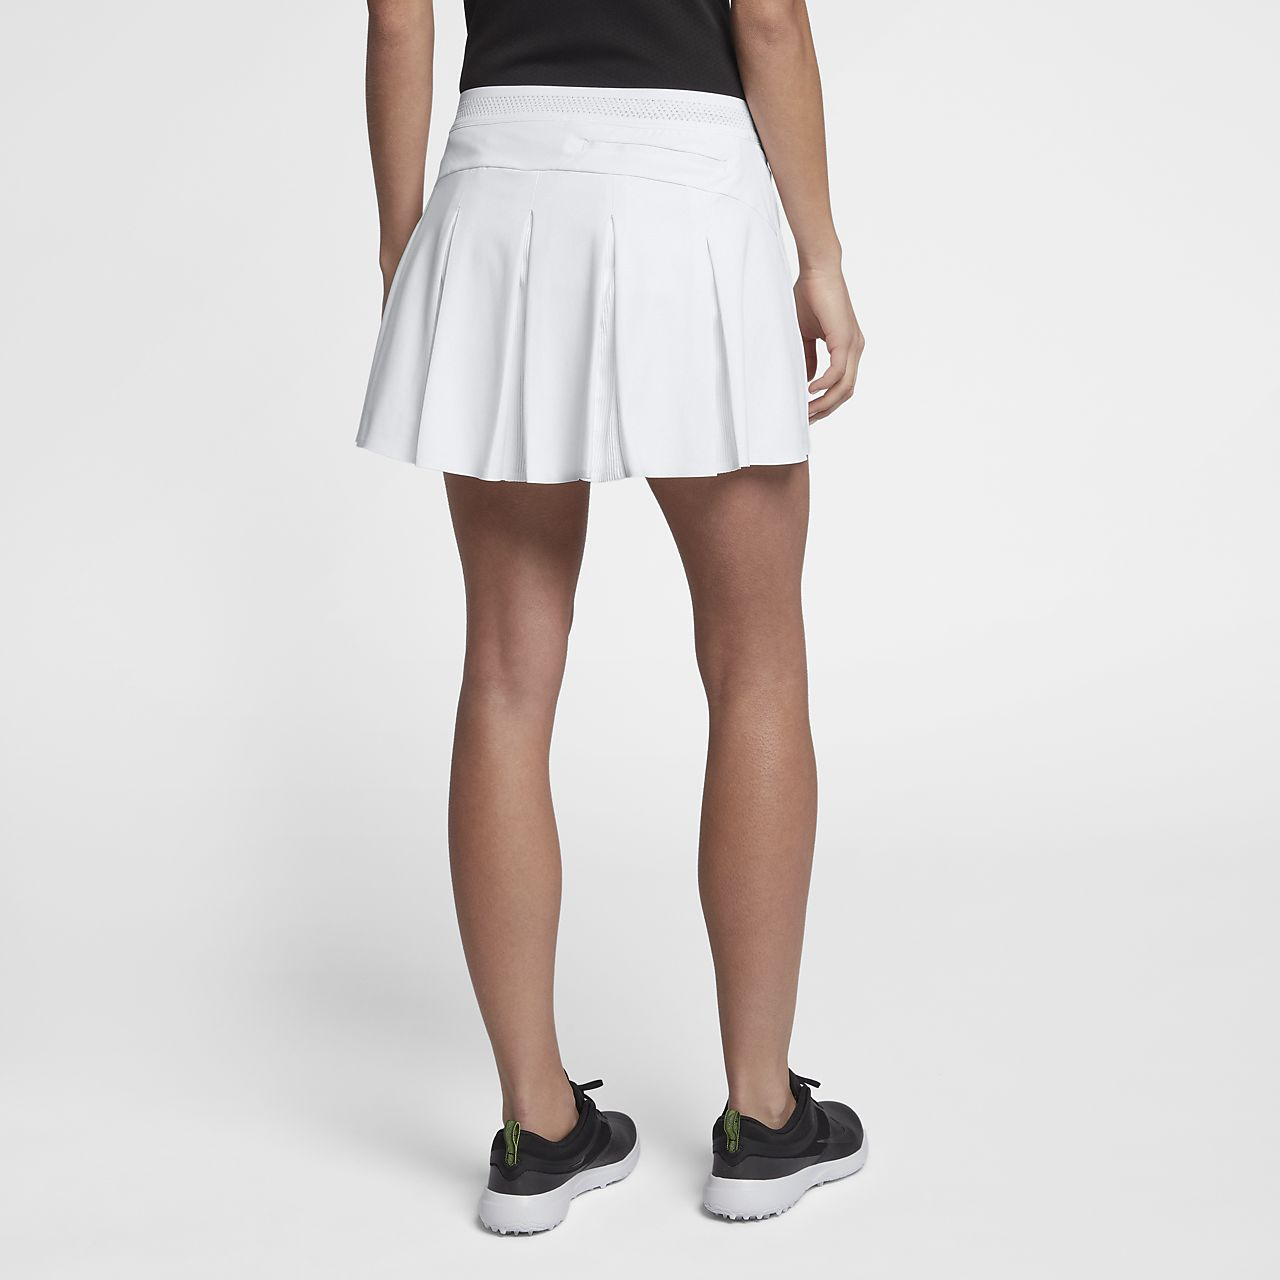 "Nike Flex Women's 14"" (35.5cm approx.) Golf Skort"